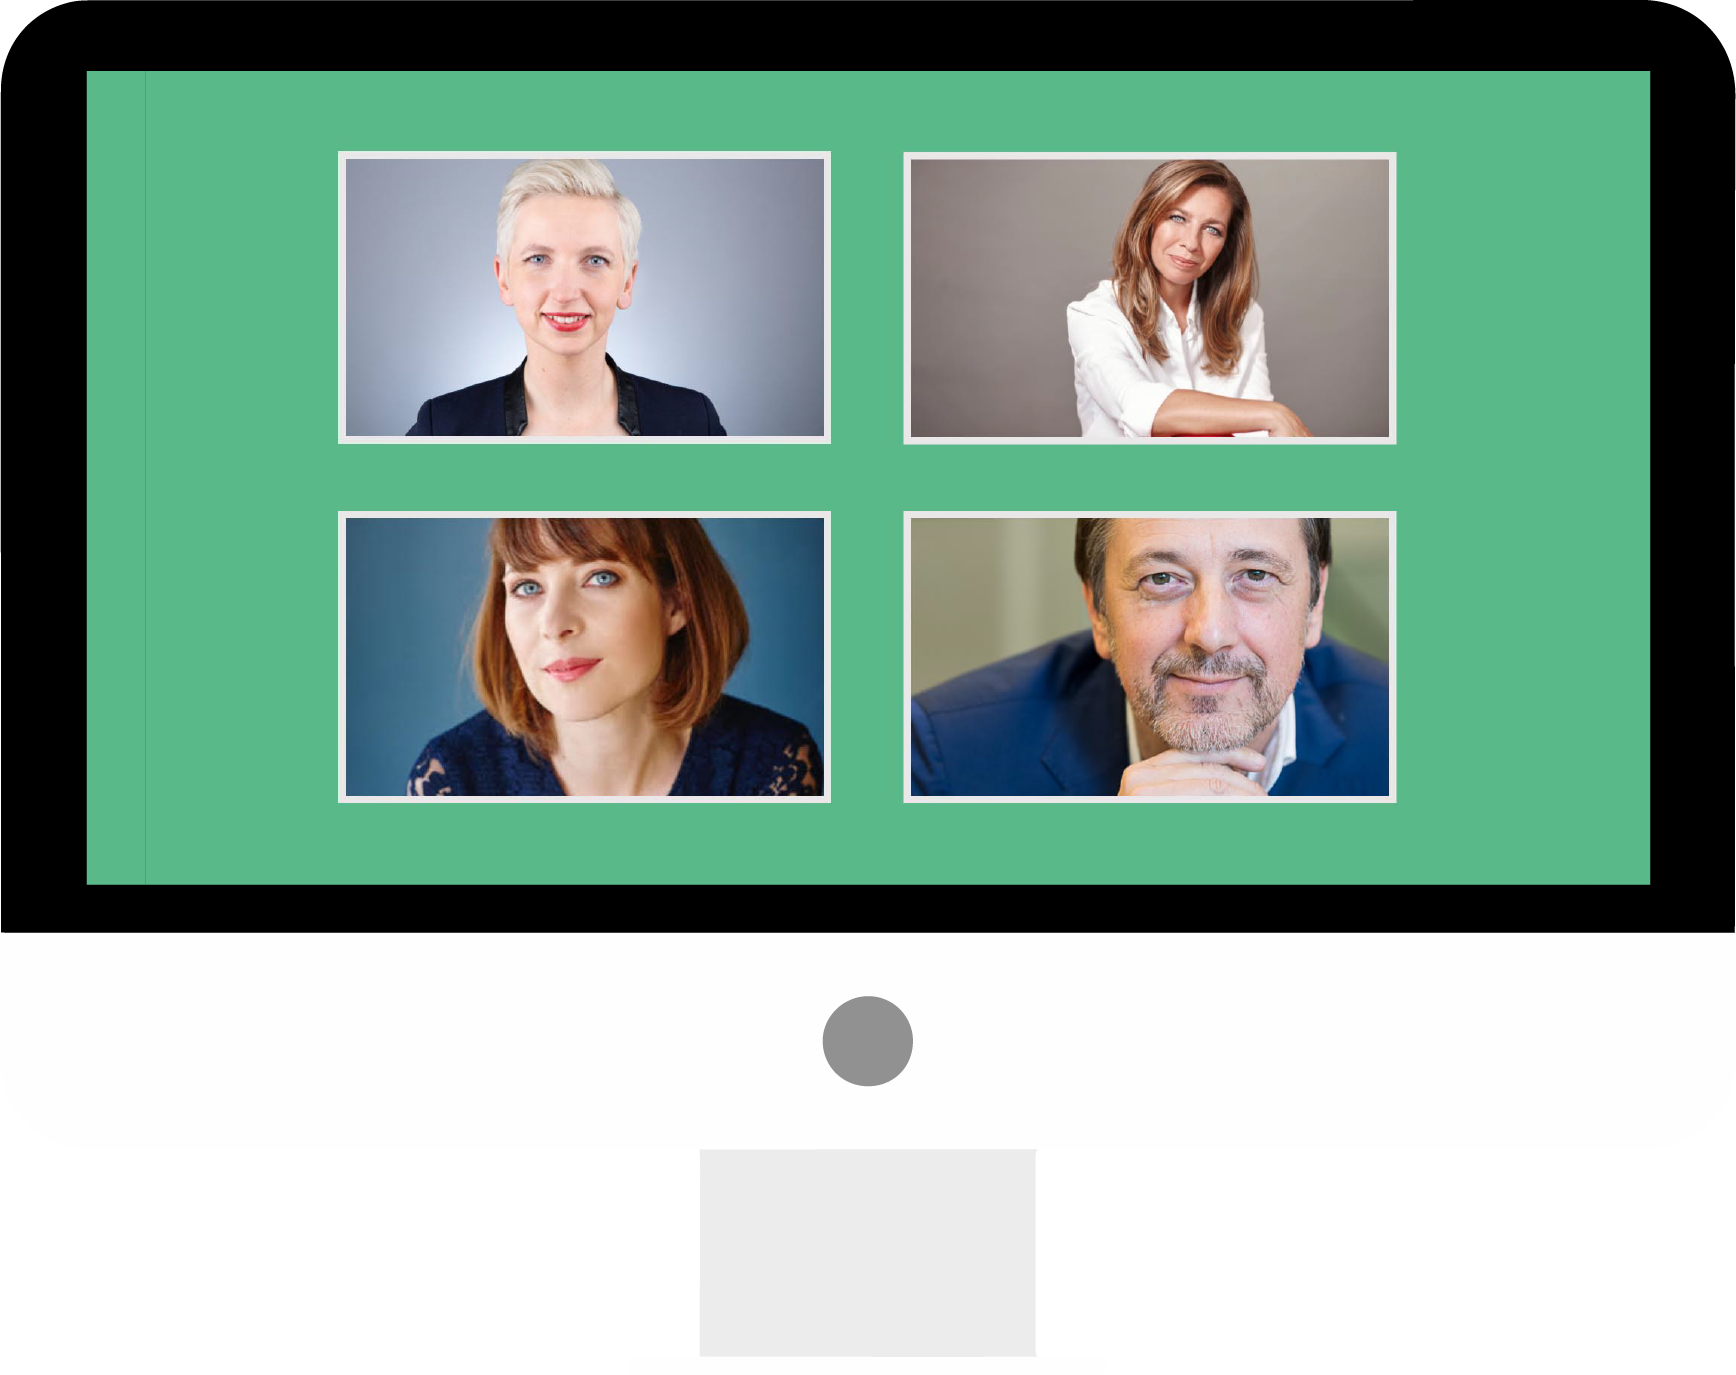 webinar Sprekershuys online gesprekssessie dagvoorzitter spreker